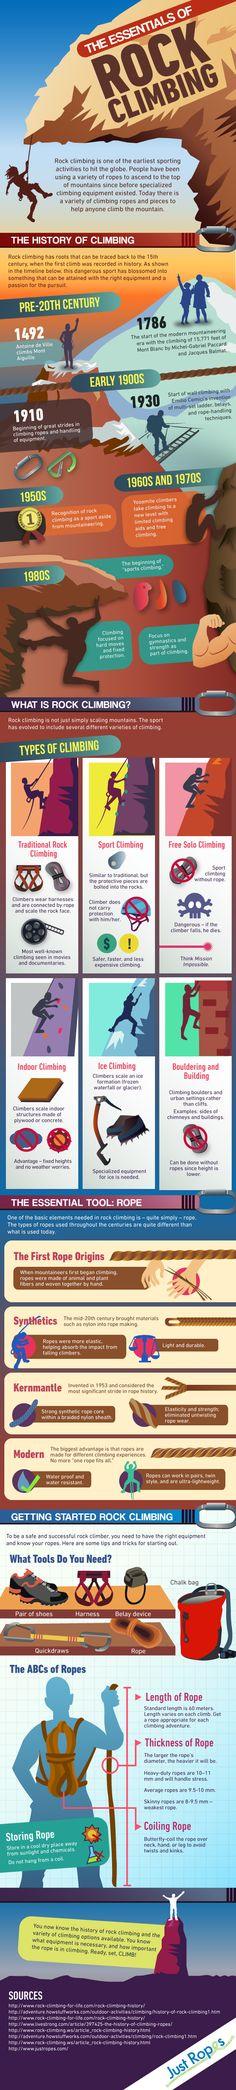 What is Rock Clmbing?